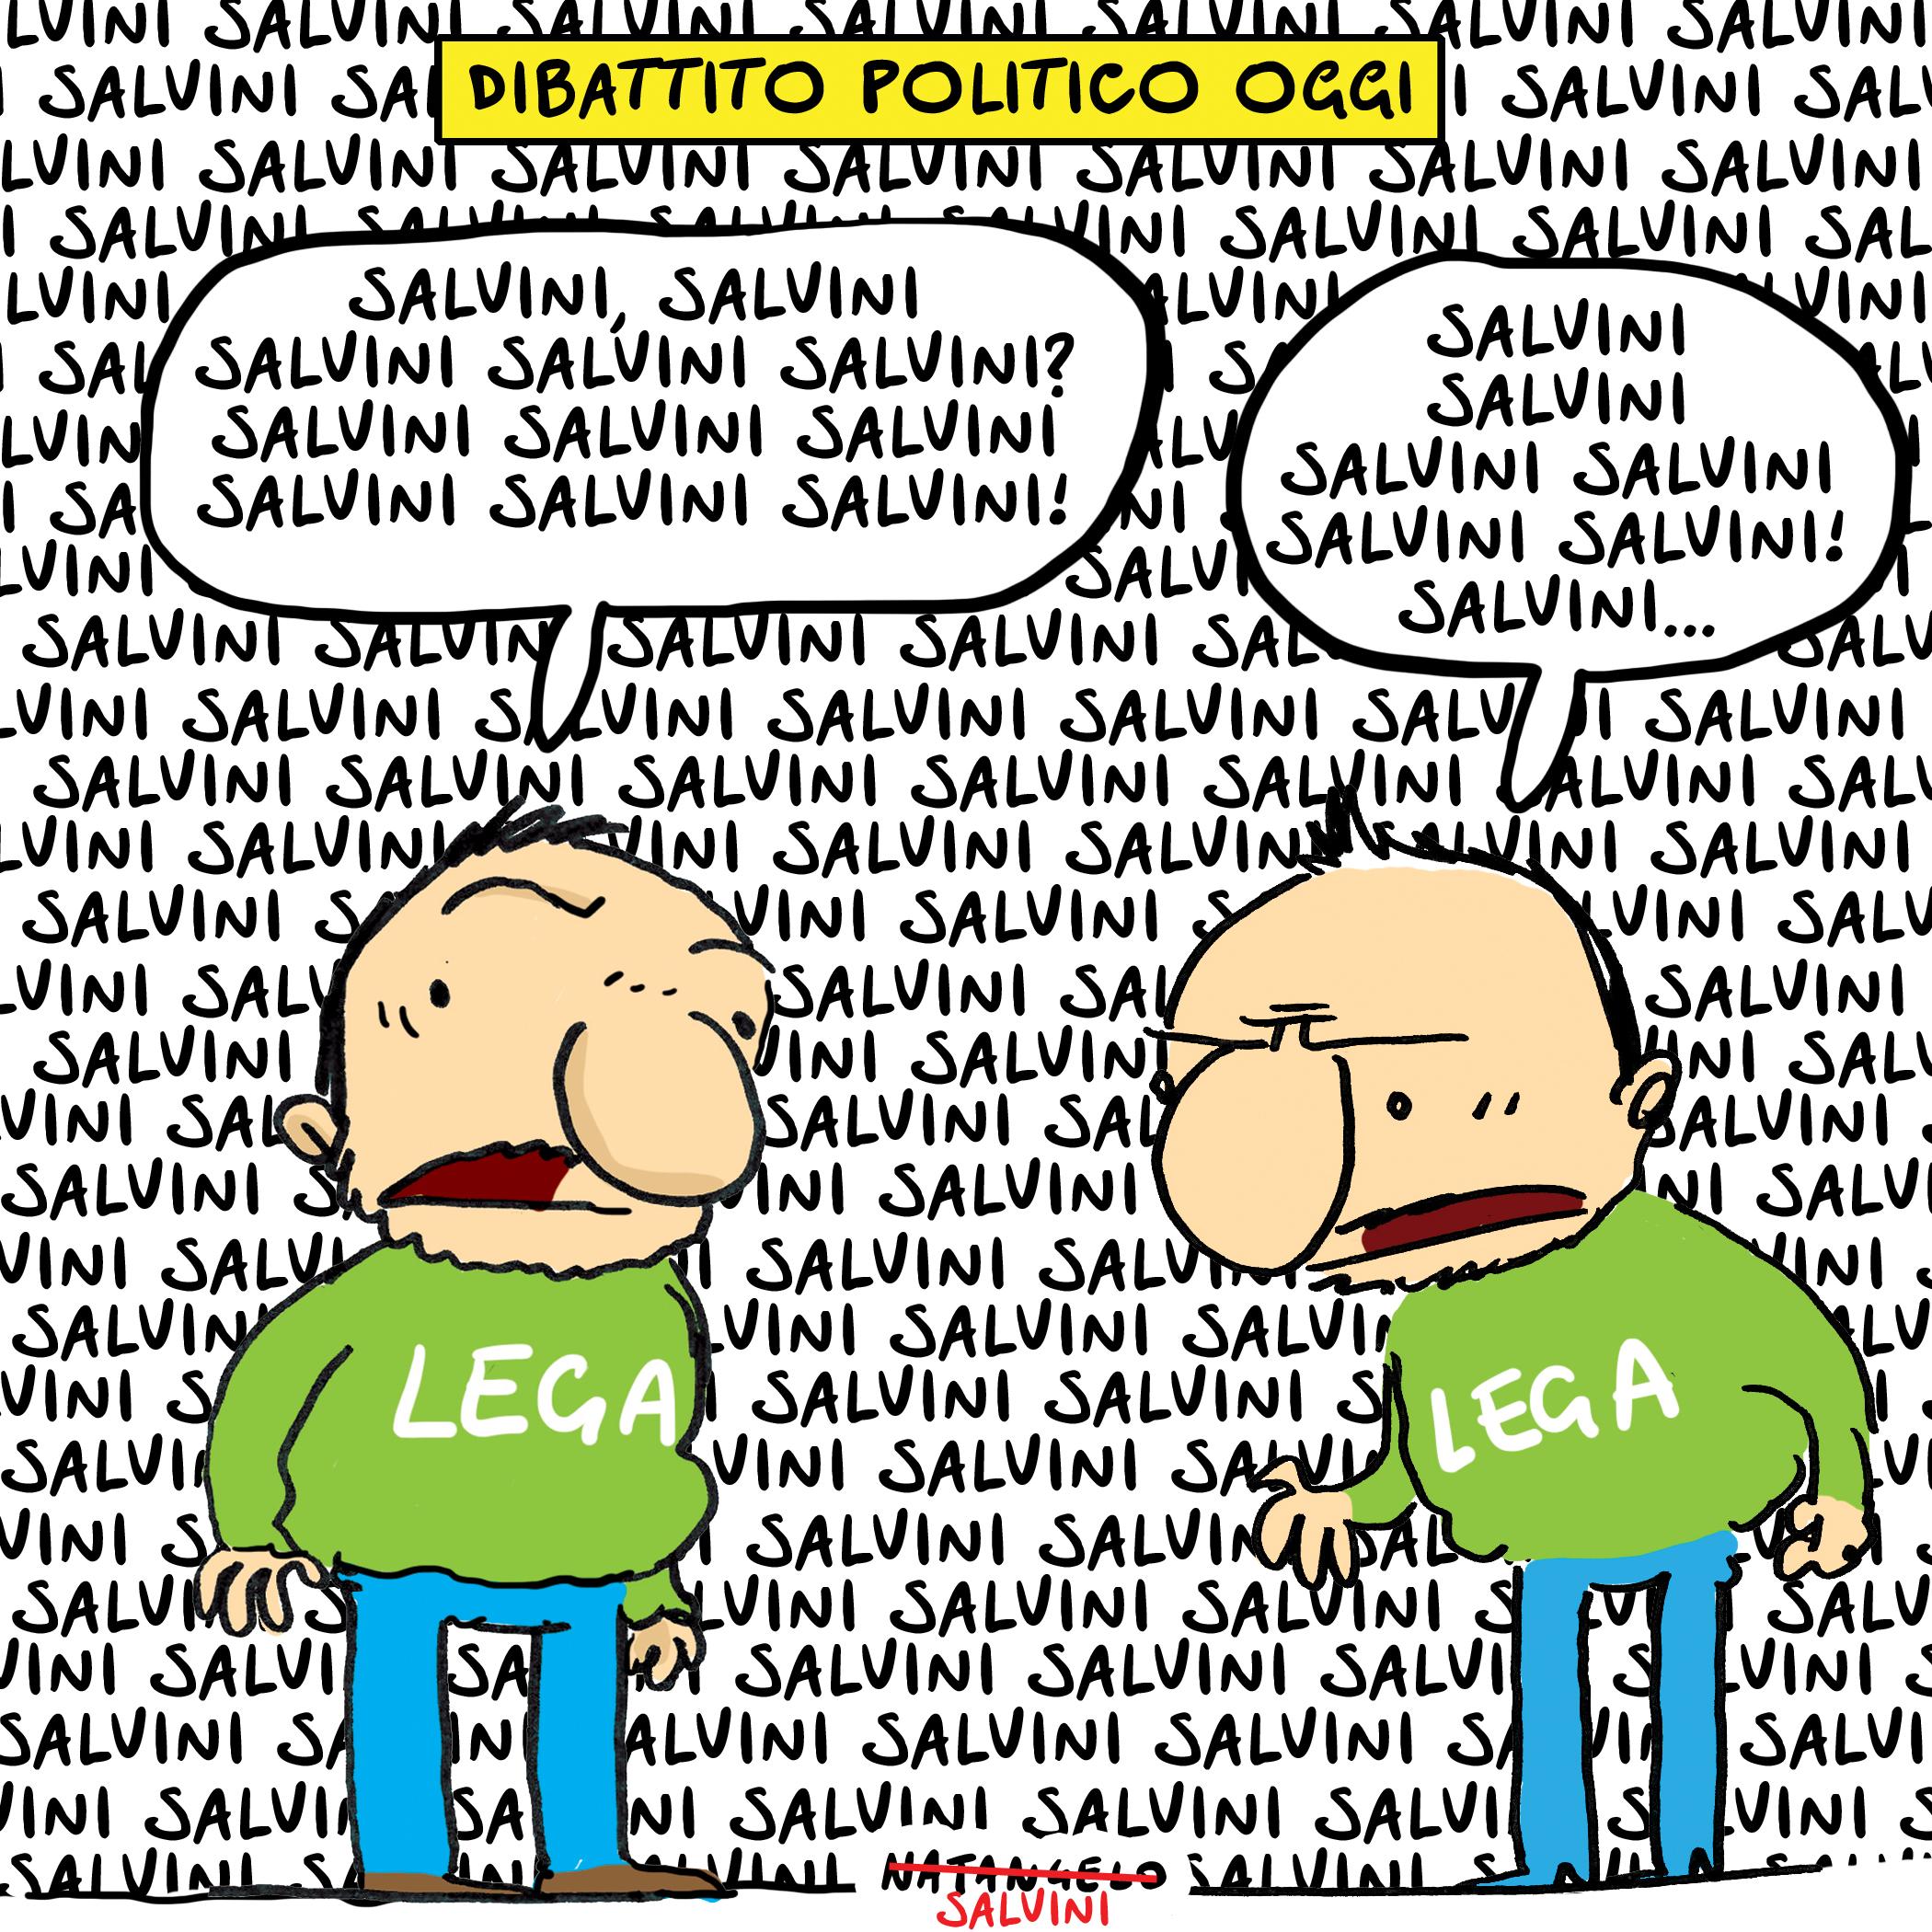 Salvini Salvini Salvini